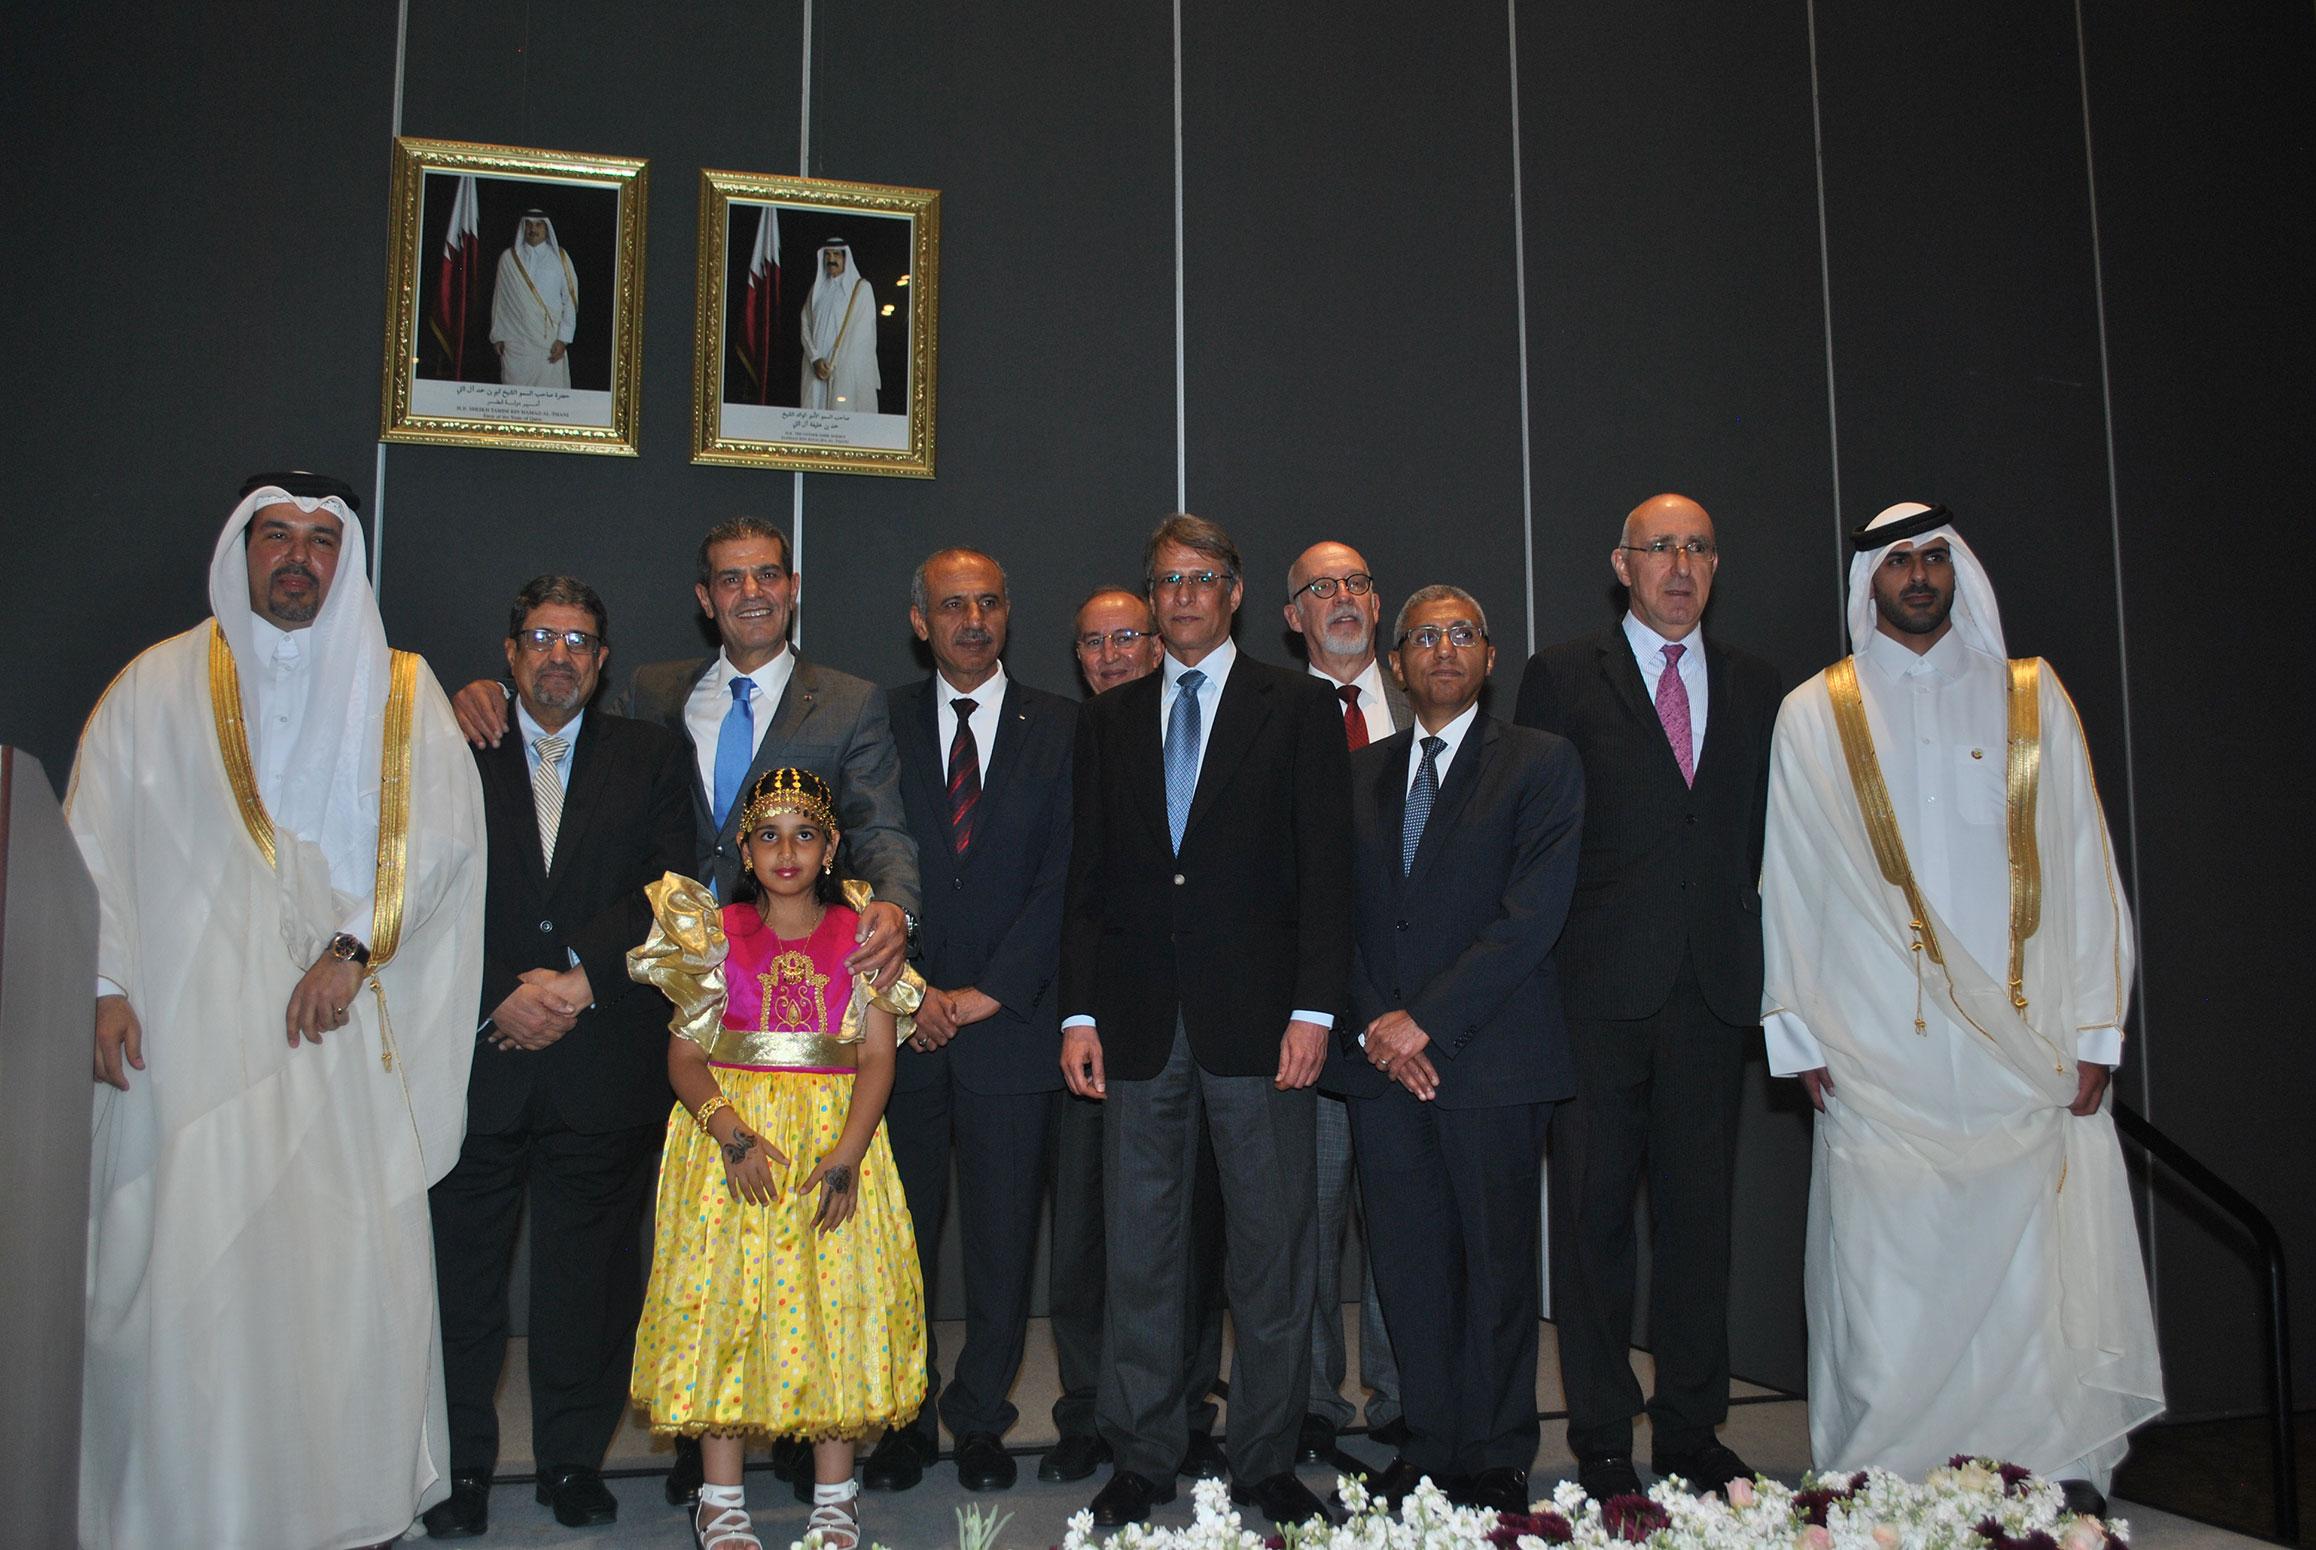 Ahmed Abdulla A. A. Al-Kuwari, embajador de Qatar, con Muftah R. M. Altayar, embajador de Libia; Abdulkarim Mansoor Obeidat, embajador de Jordania; Mohamed A. I. Saadat, embajador de Palestina; Ará Aivazian, embajador de Armenia; Muteb Saleh F. Almutoteb, embajador de Kuwait; Jorge Álvarez Fuentes, Yasser Mohamed Ahmed Shaban, embajador de Egipto; Rabah Hadid, embajador de Armenia, y Fahad Hamad S. M. al Eida, acompañados por la hija del embajador de Qatar